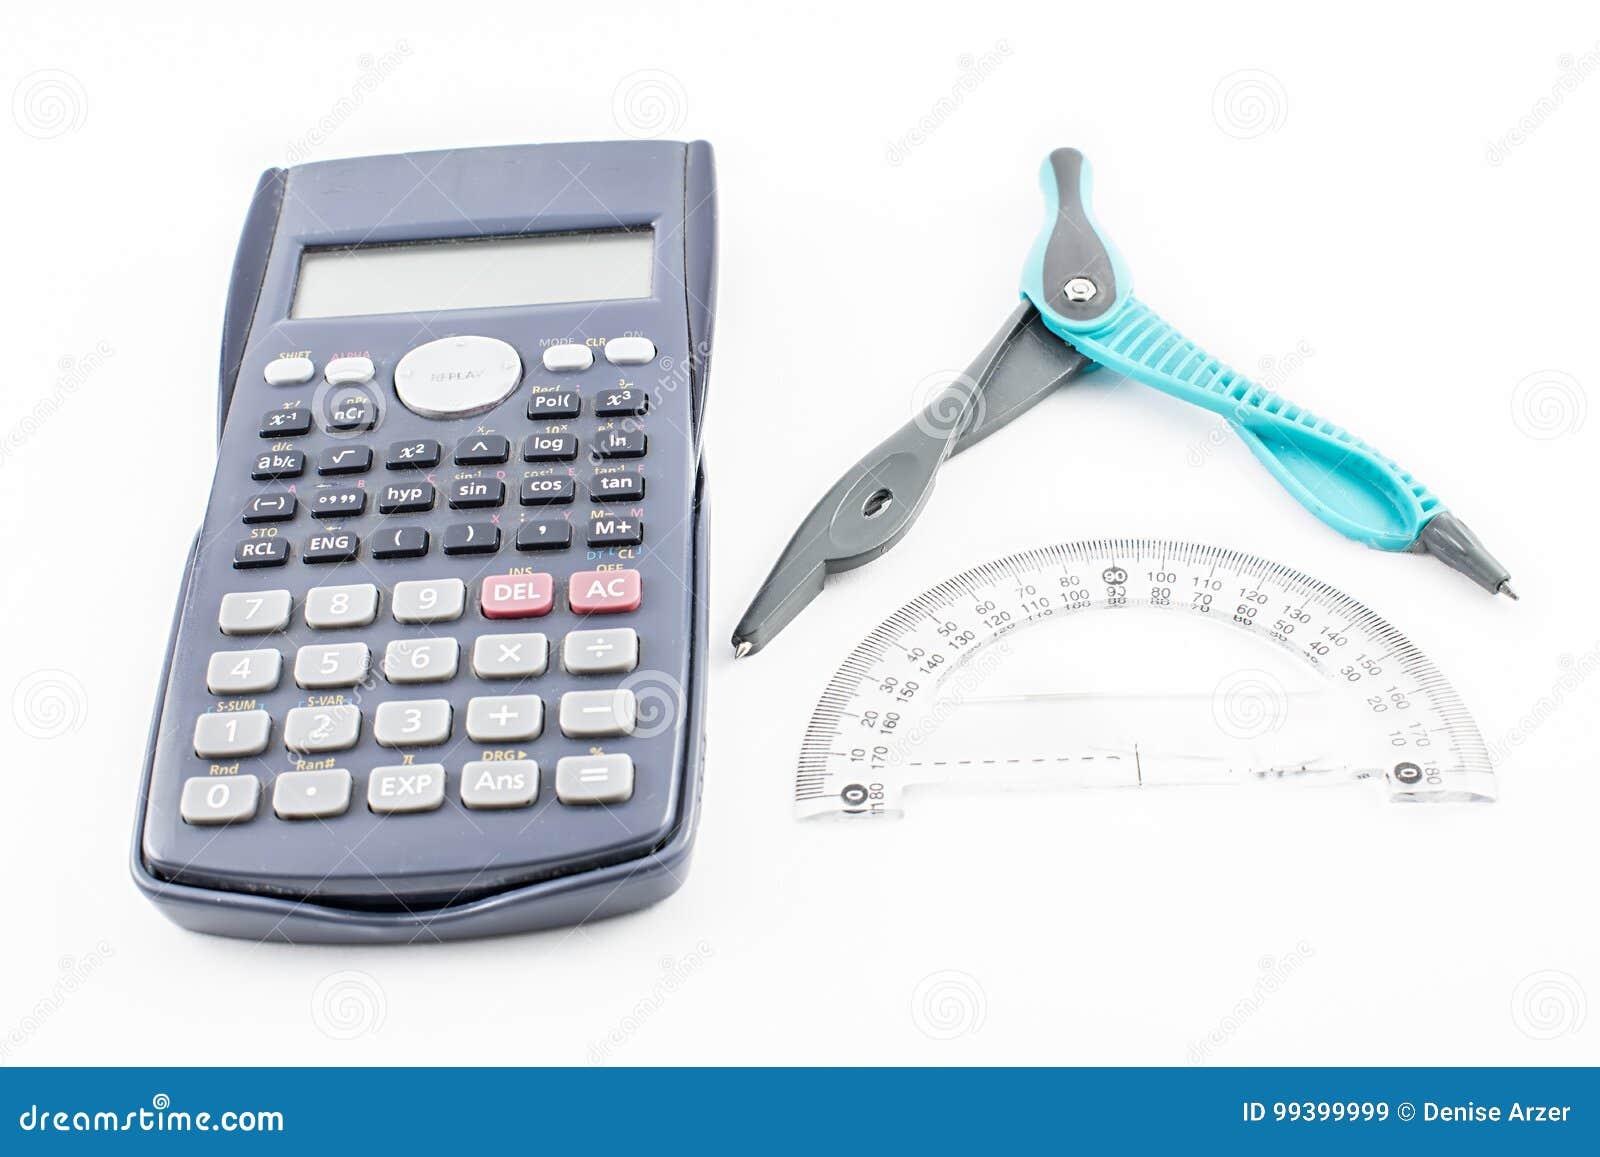 Kalkulator, konwejer i kompas,